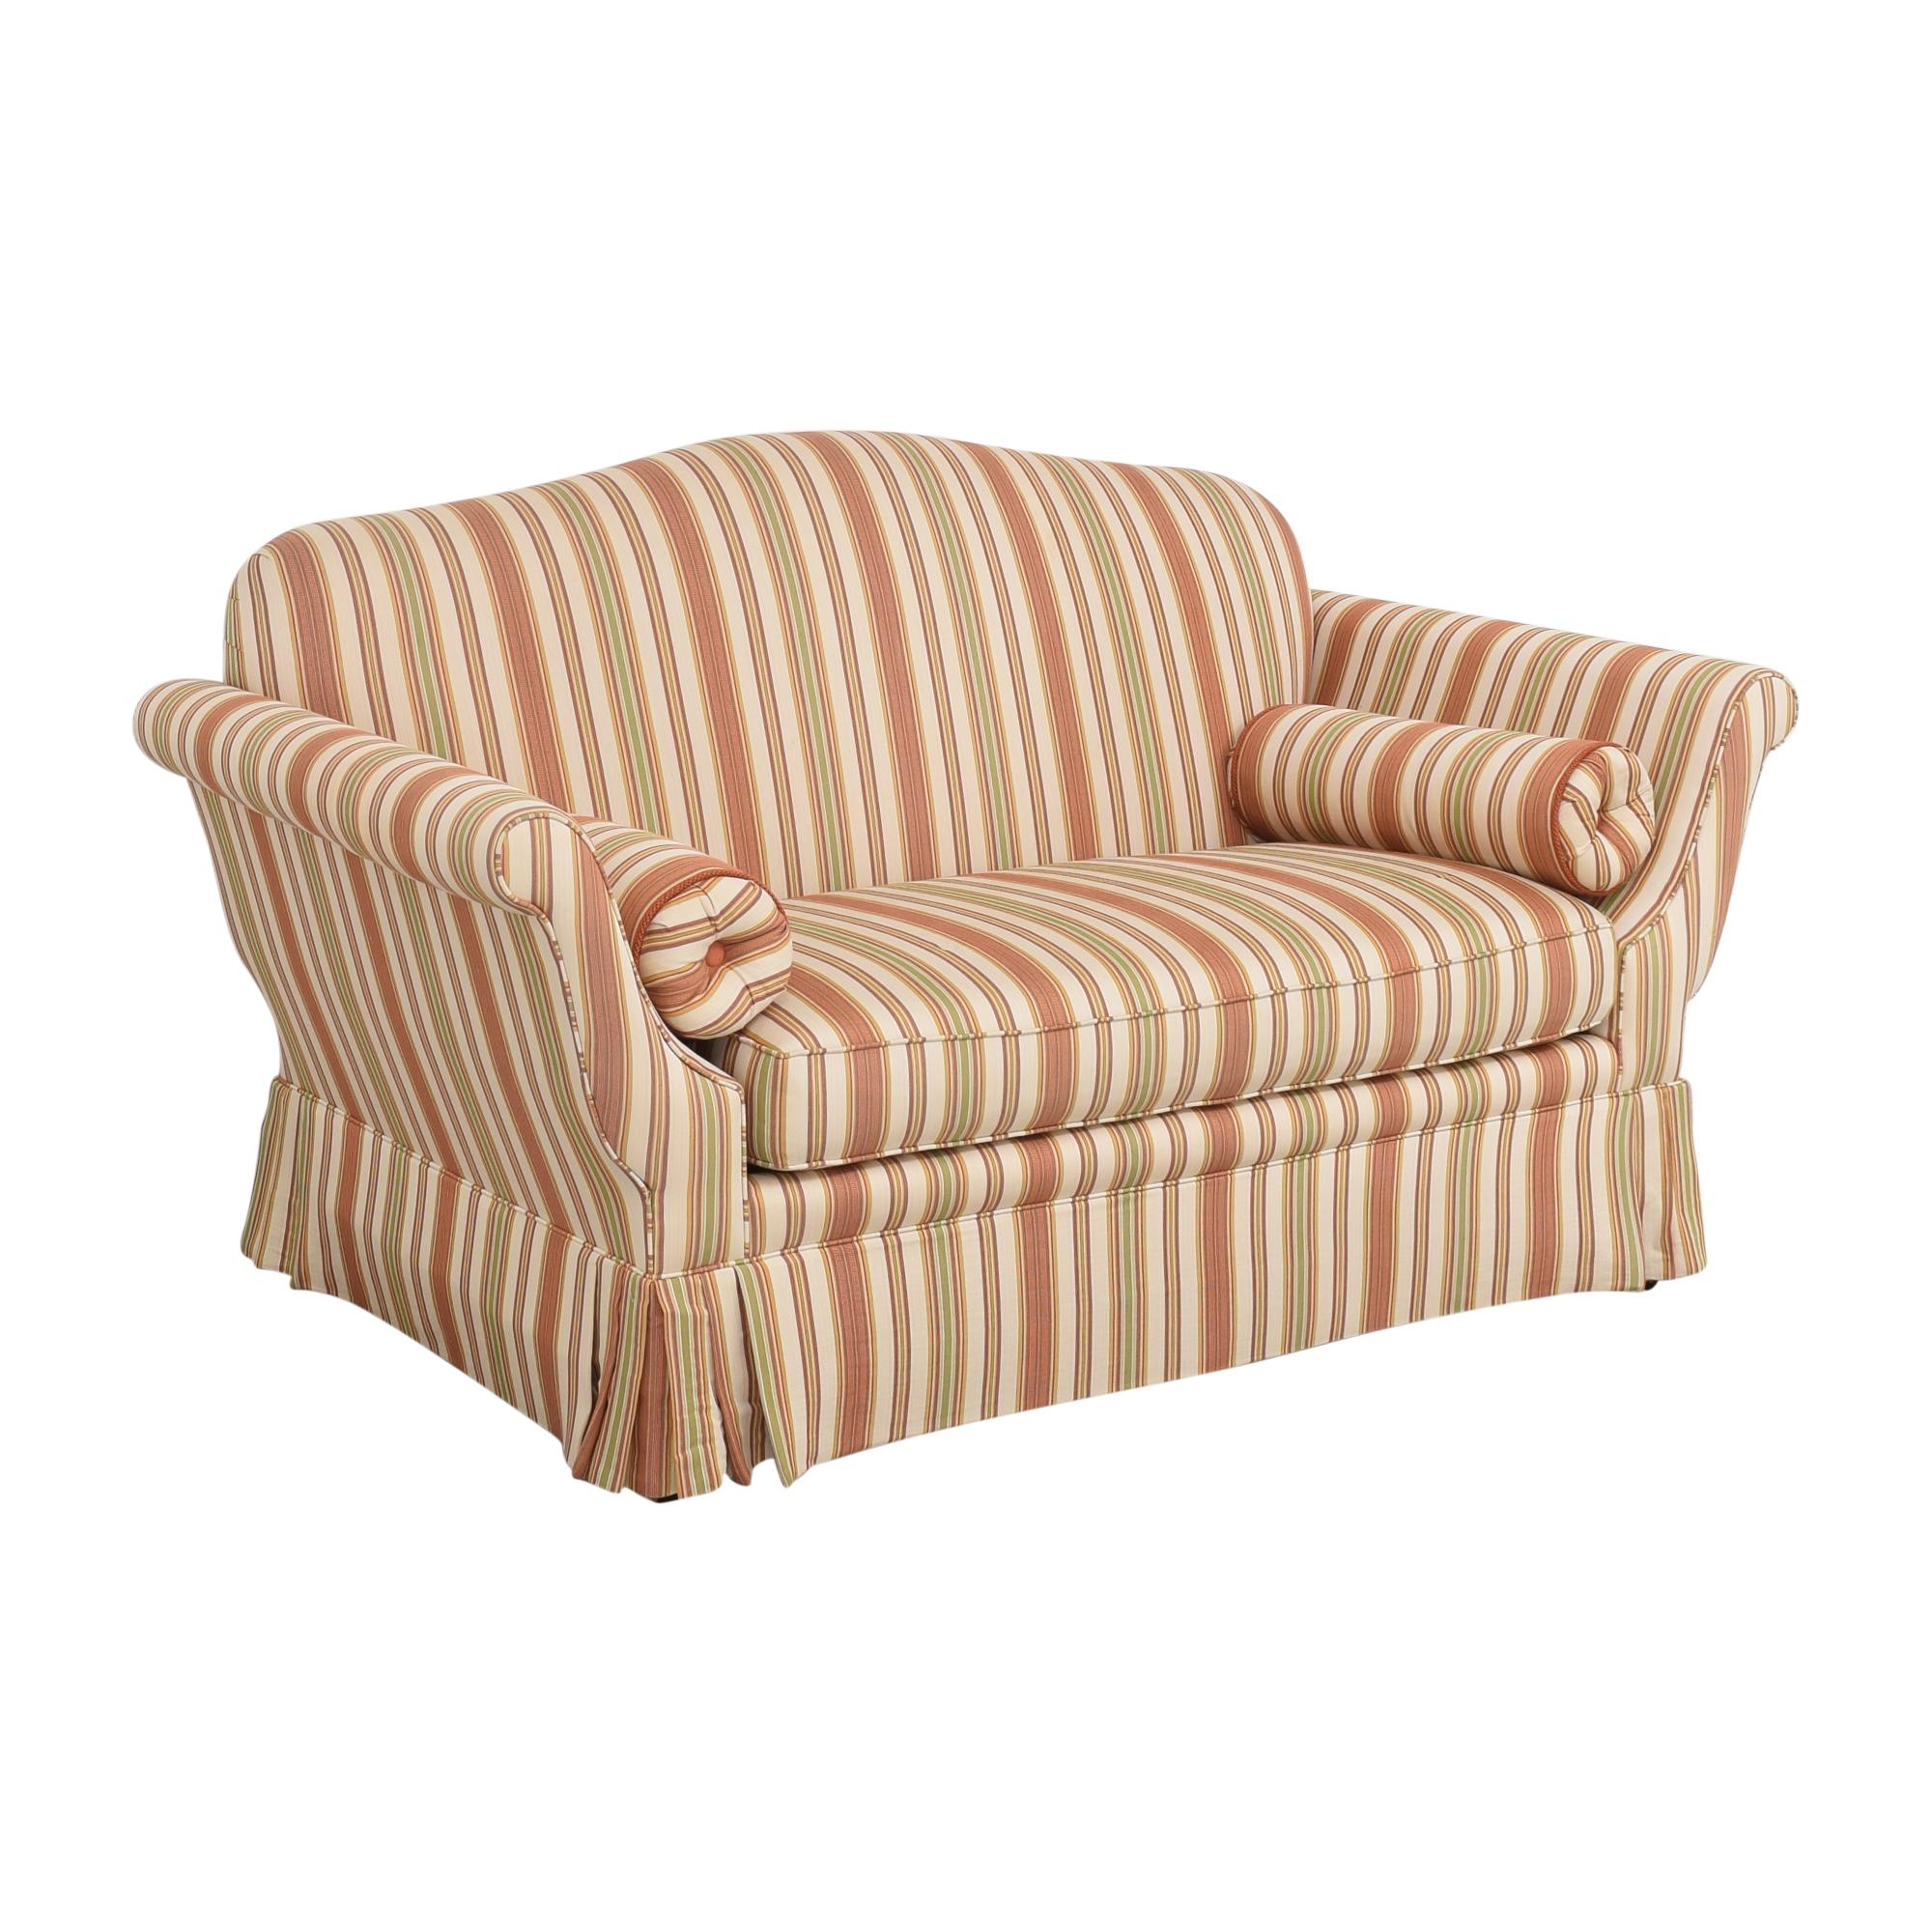 Taylor King Taylor King Camelback Bench Cushion Sofa for sale